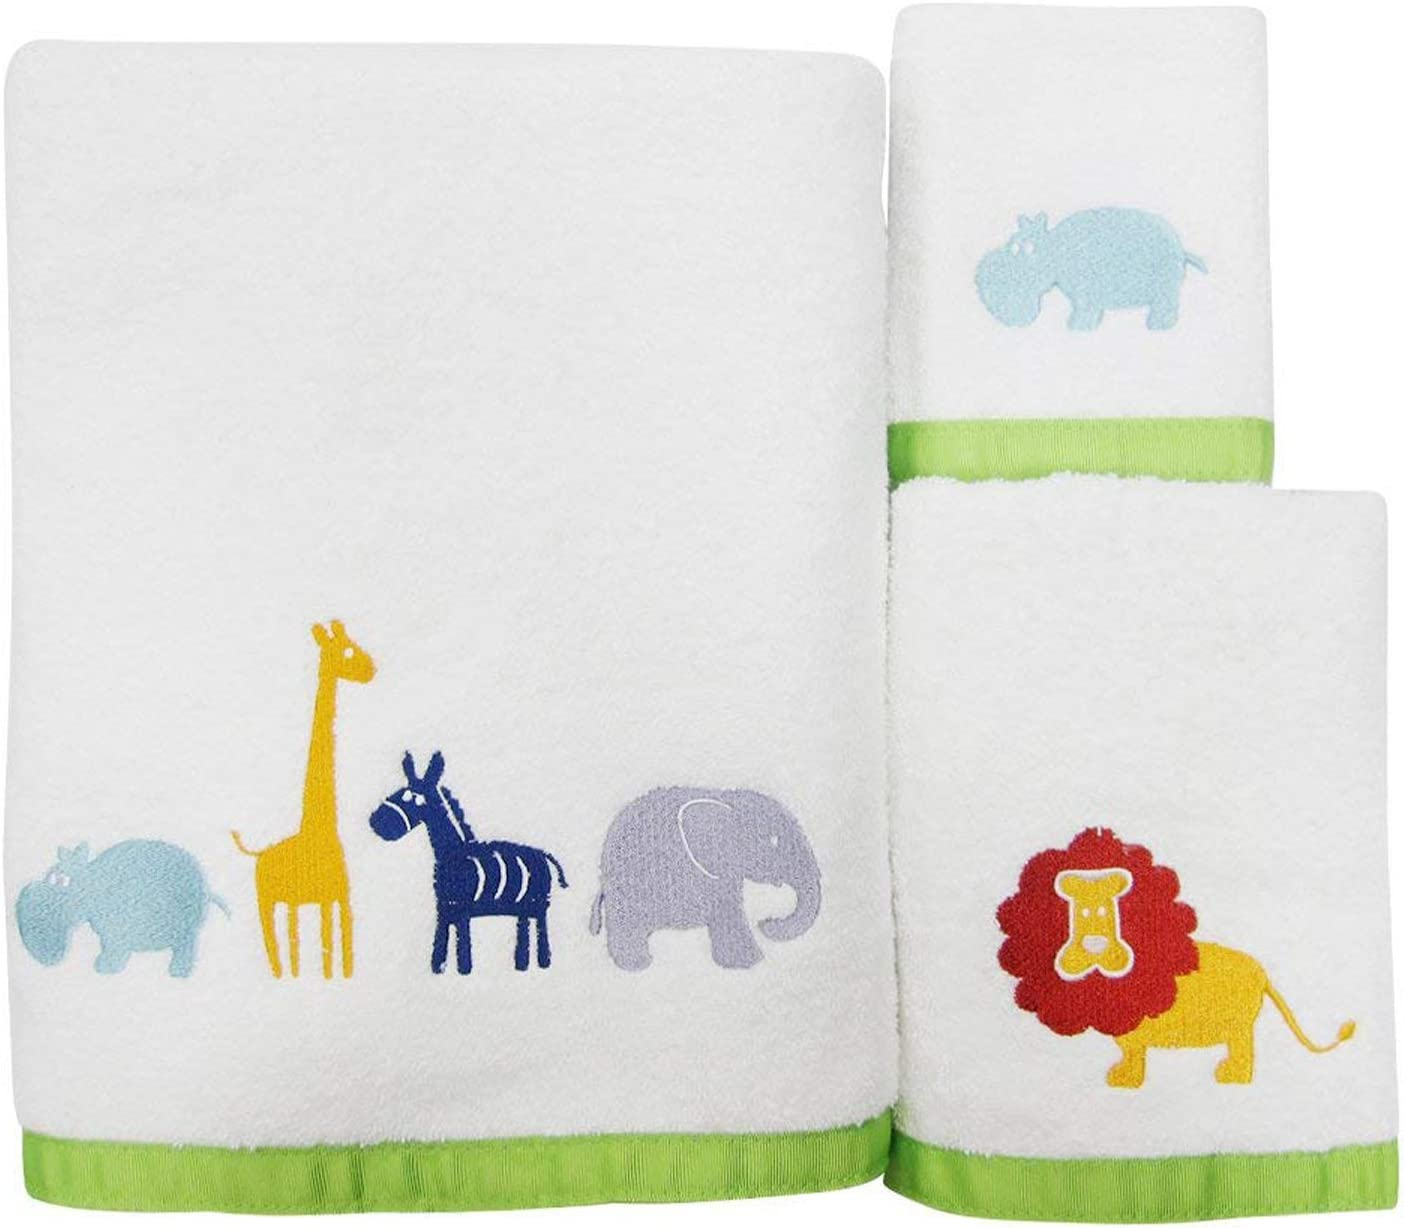 Allure Home Creation Hippo Cotton Three Piece Towel Set